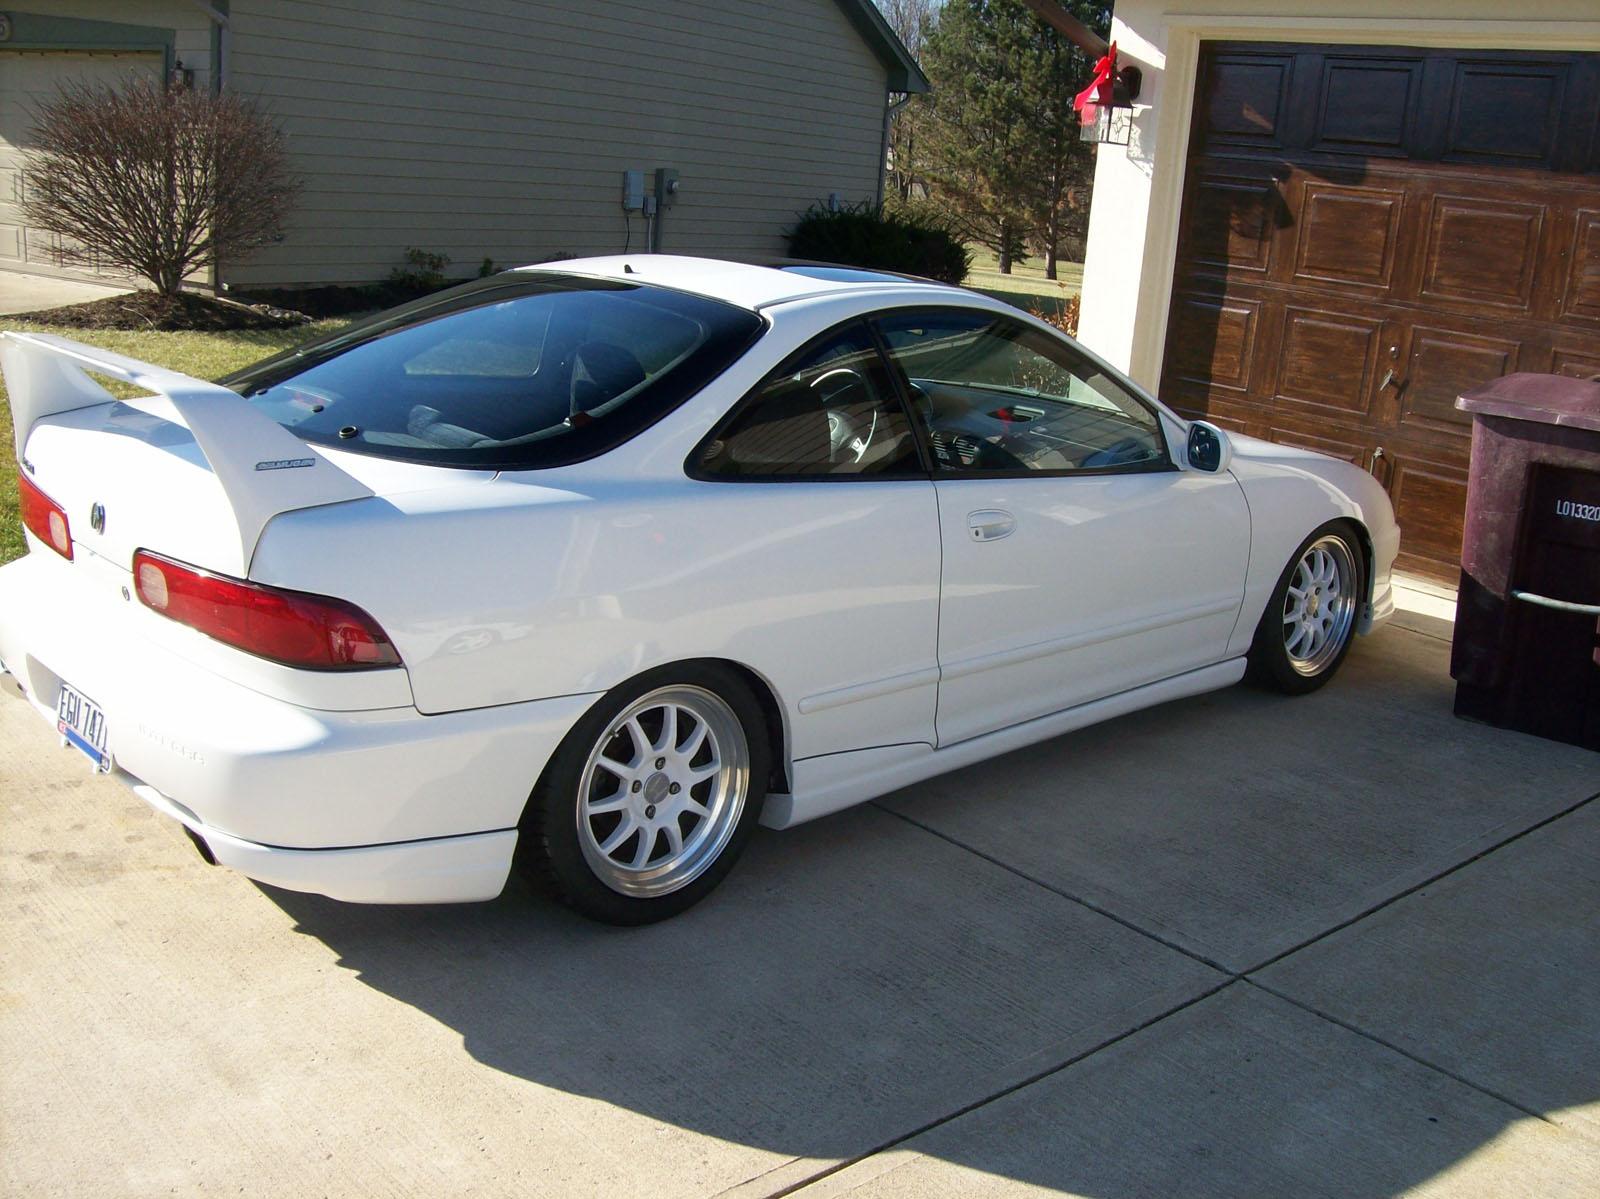 1999 Acura DC4 Integra LS